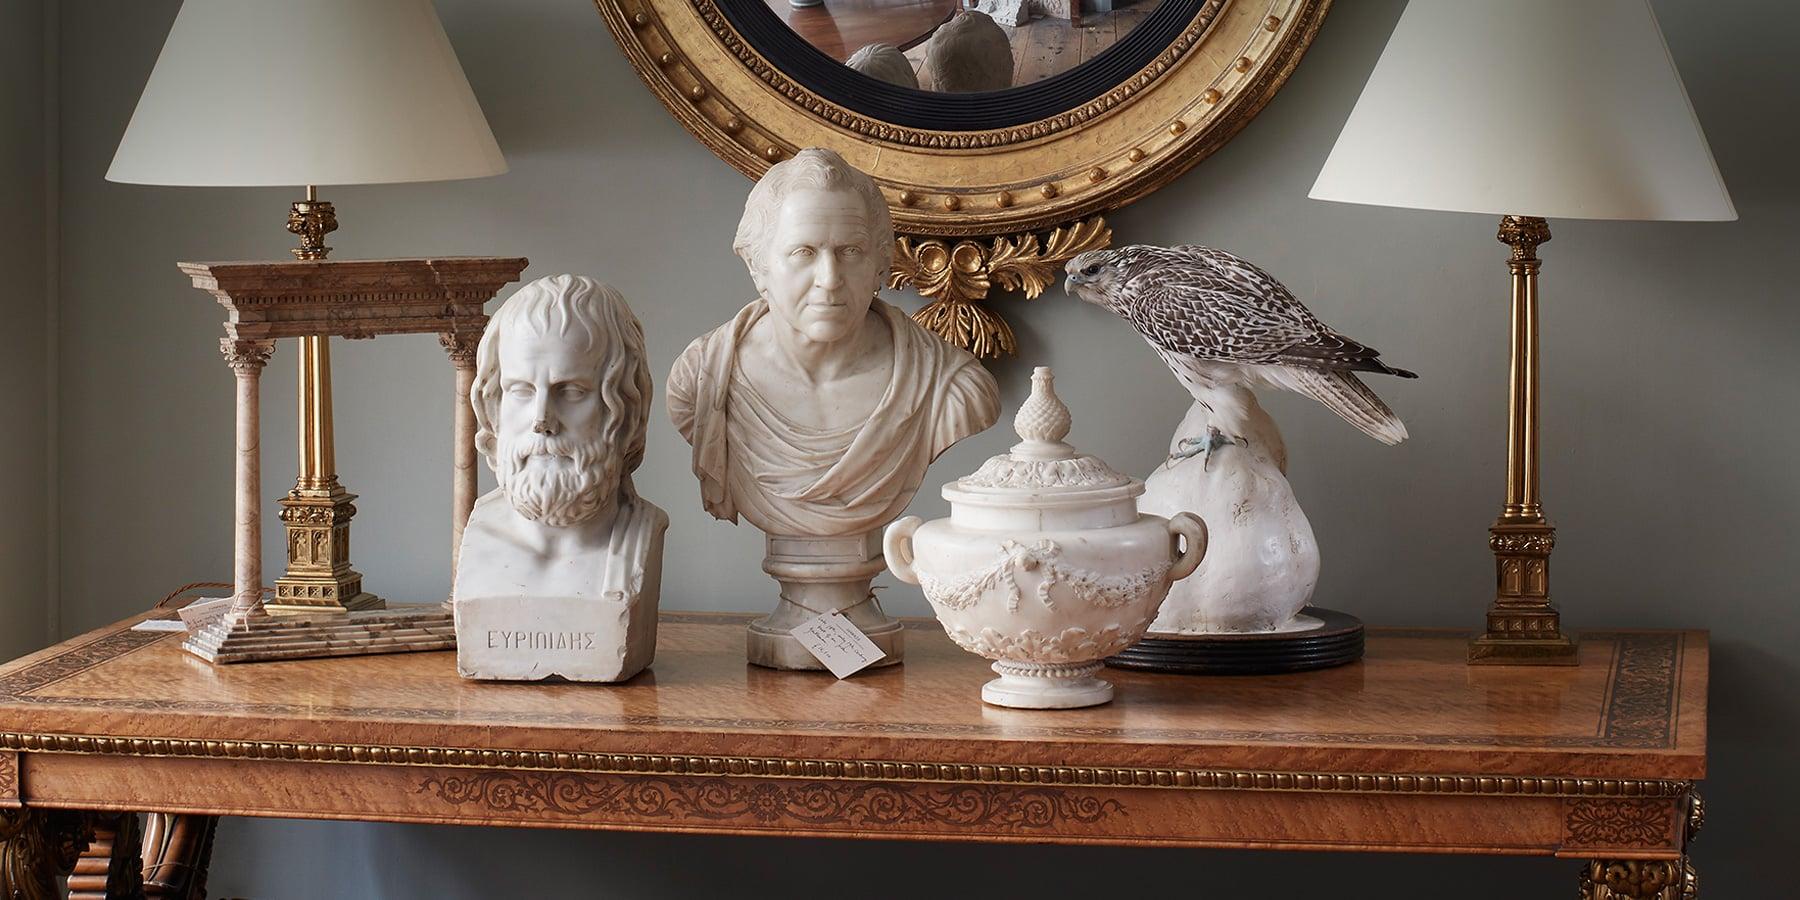 Antique busts